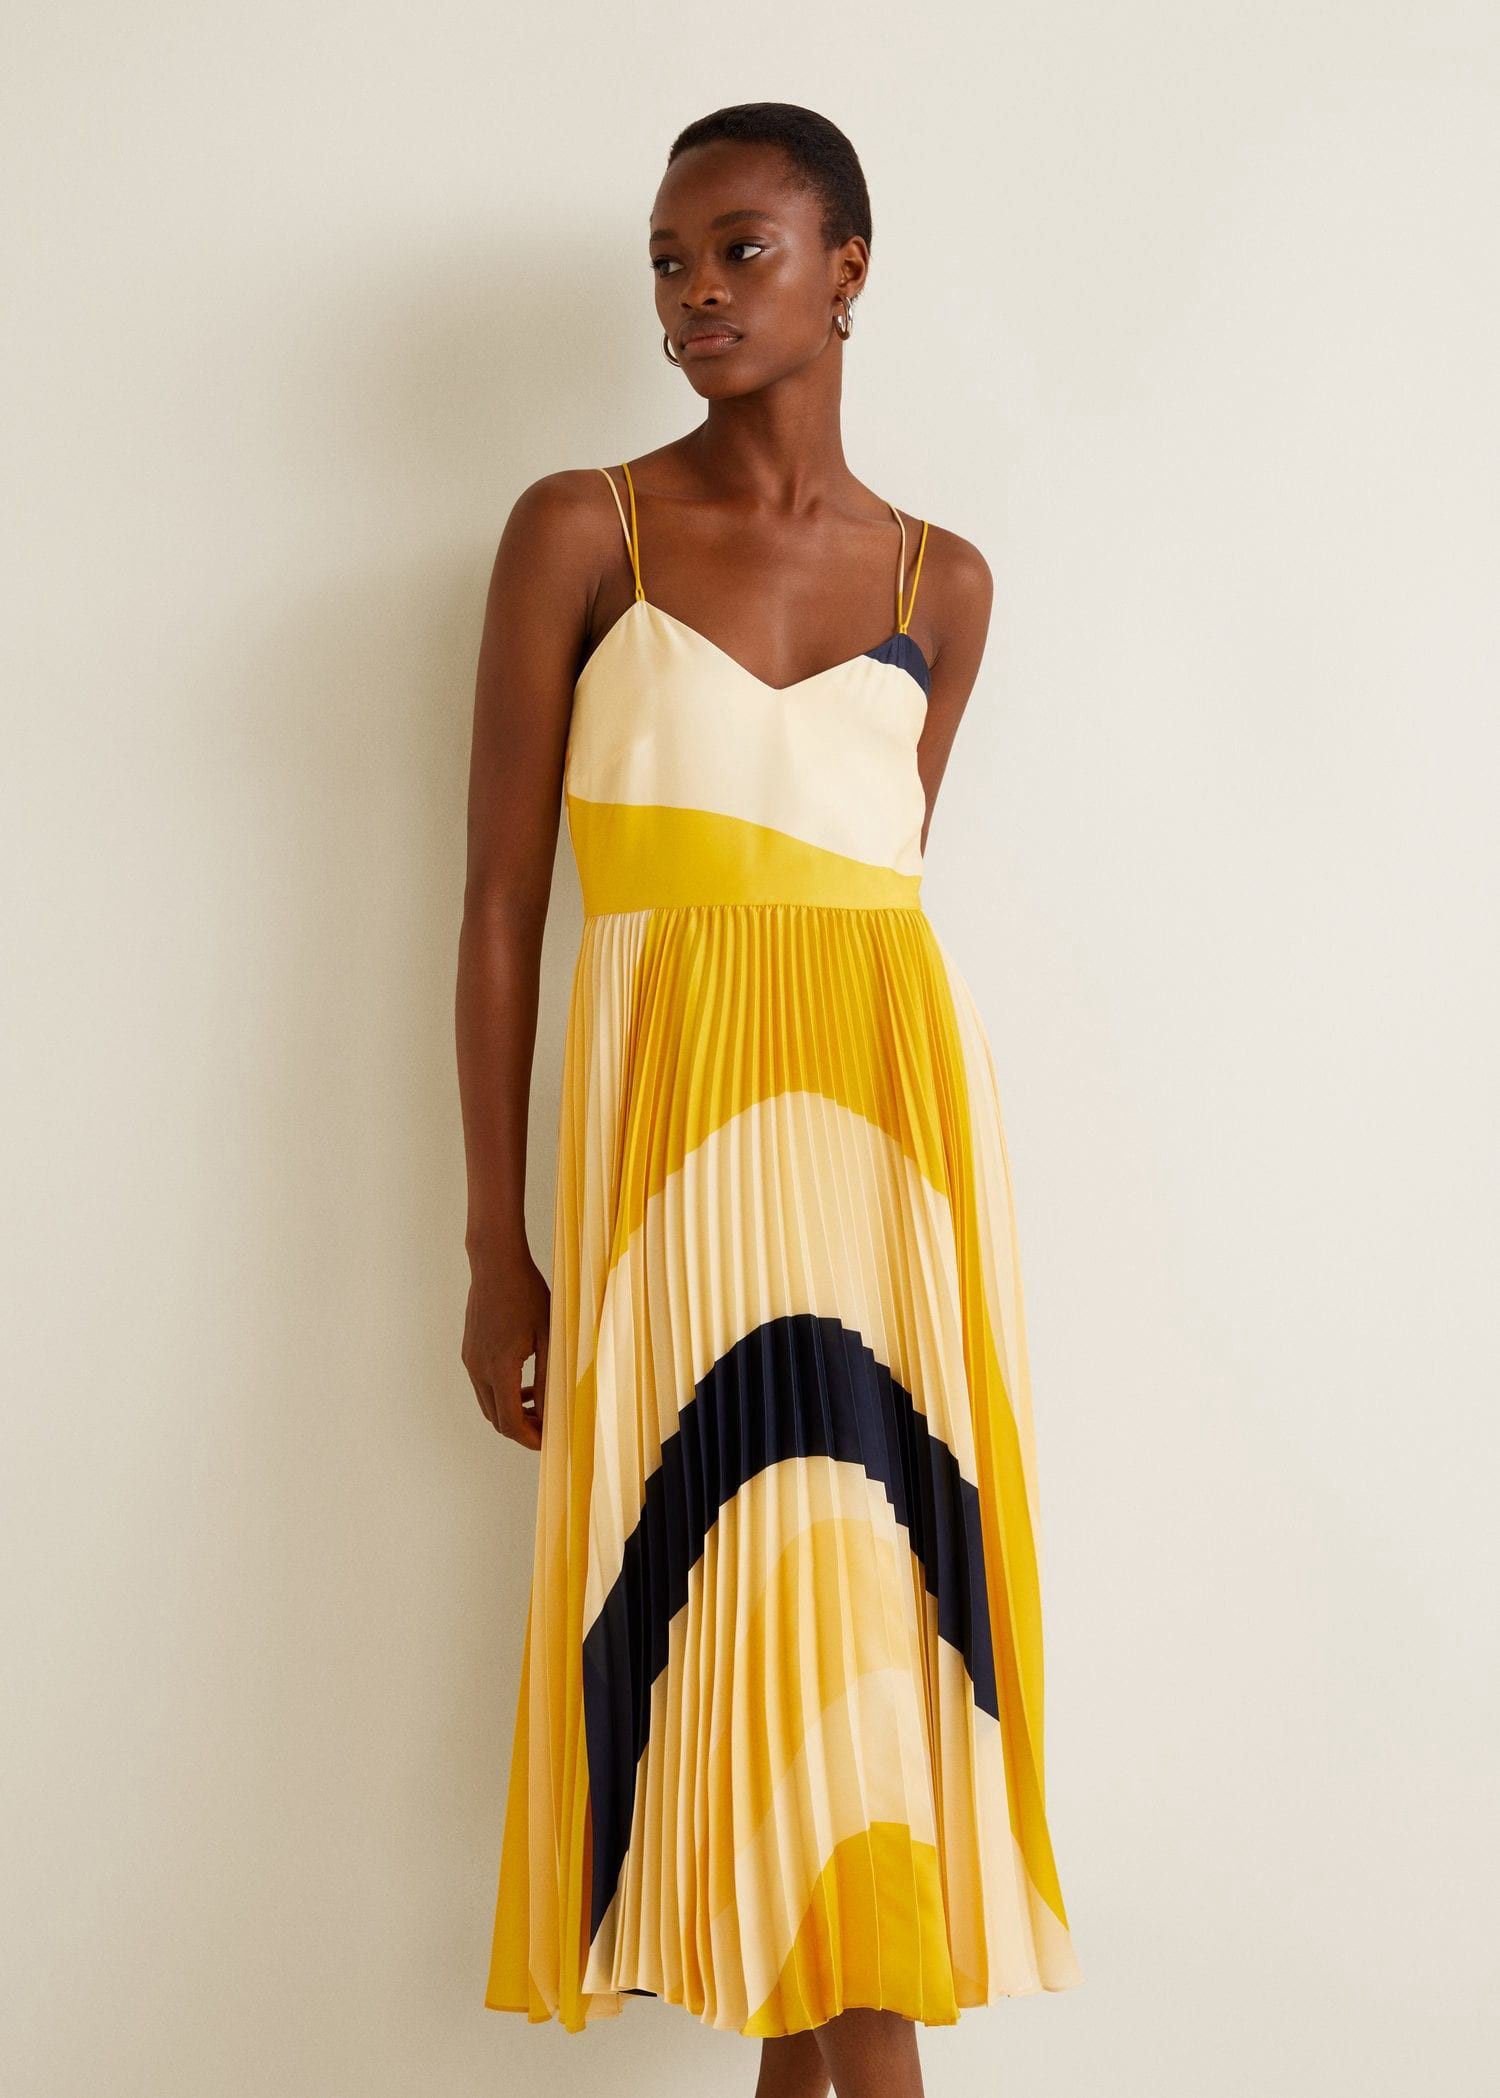 901e06eebcb5d6 Mango Printed Pleated Dress - 6 | Products | Dresses, Tie dye skirt ...